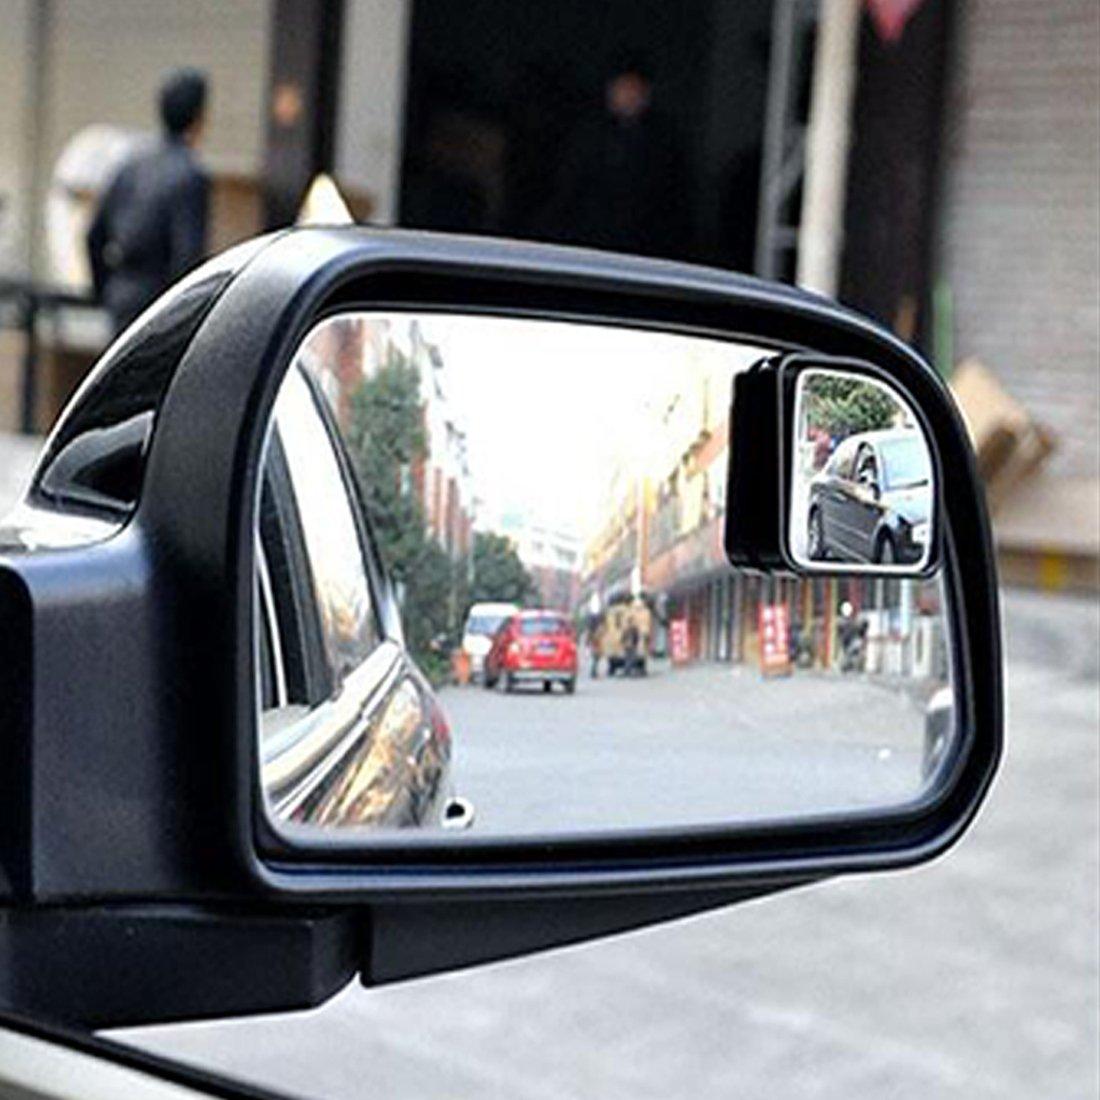 Andux Zone Blind Spot Spiegel HD Glas konvex Weitwinkel R/ückansicht Auto Stick On Lens 2 St/ücke QC-MDJ-01 Rechteck Form